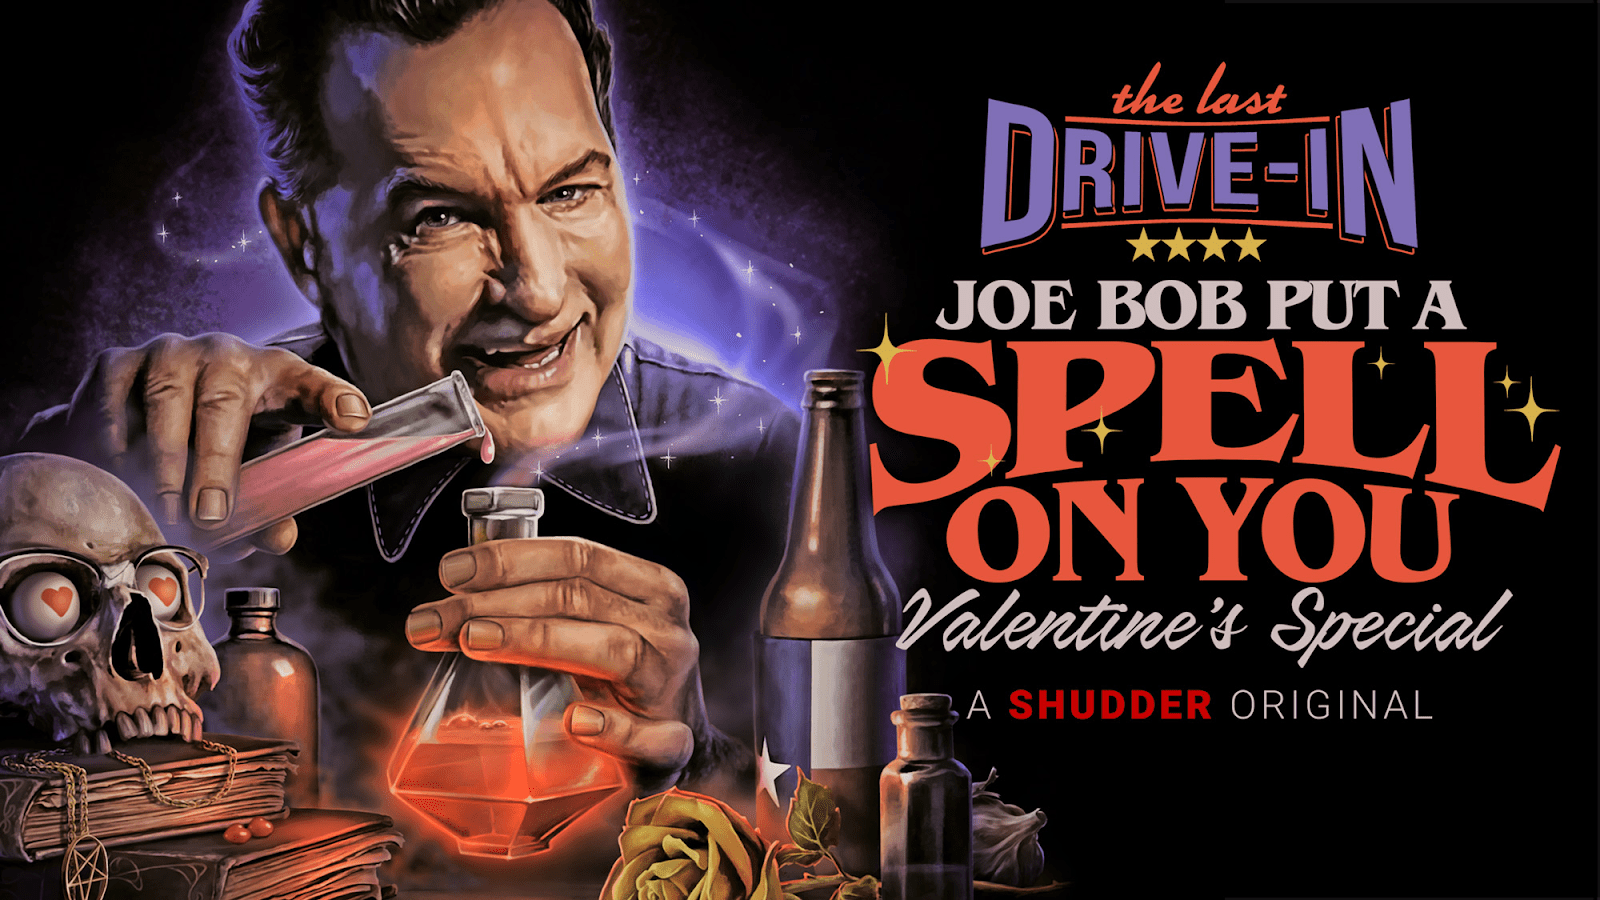 Joe Bob Put a Spell On You